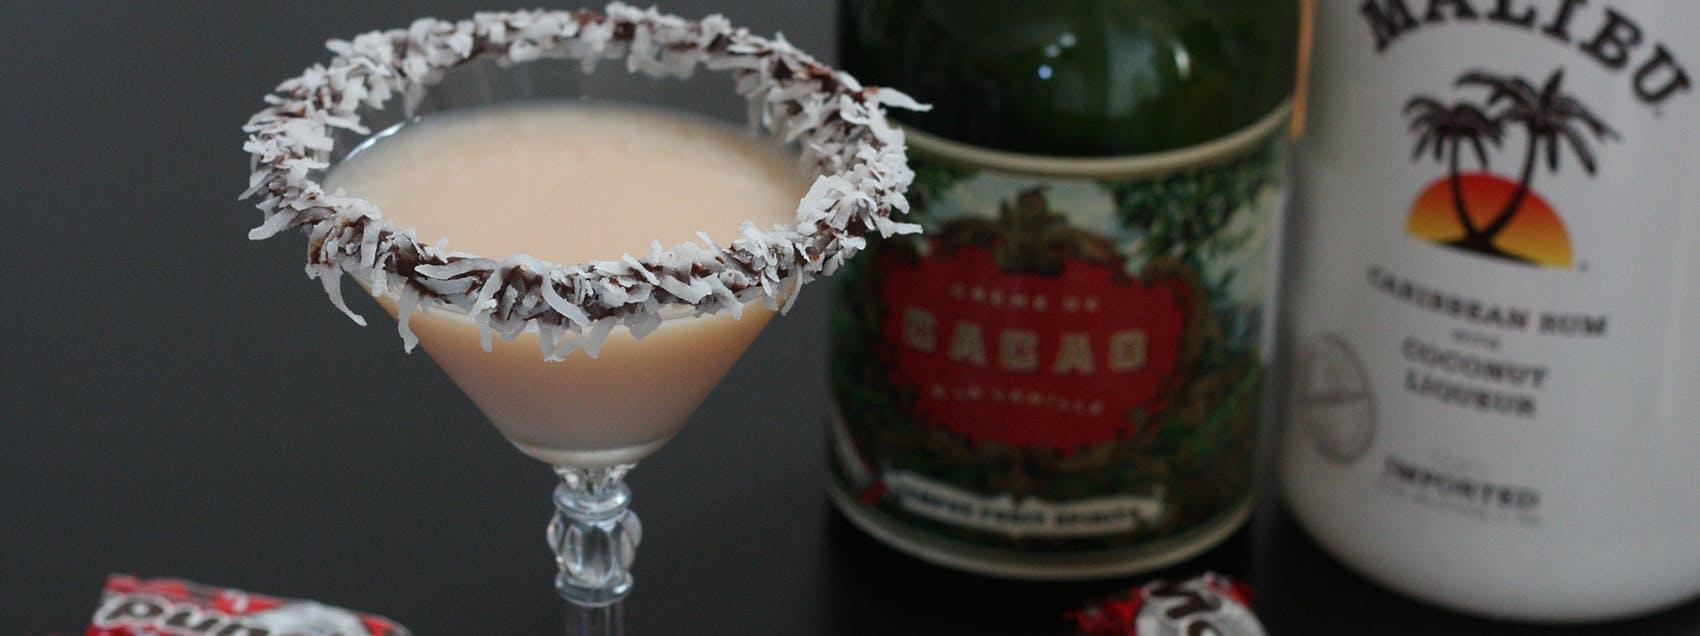 Mounds Martini